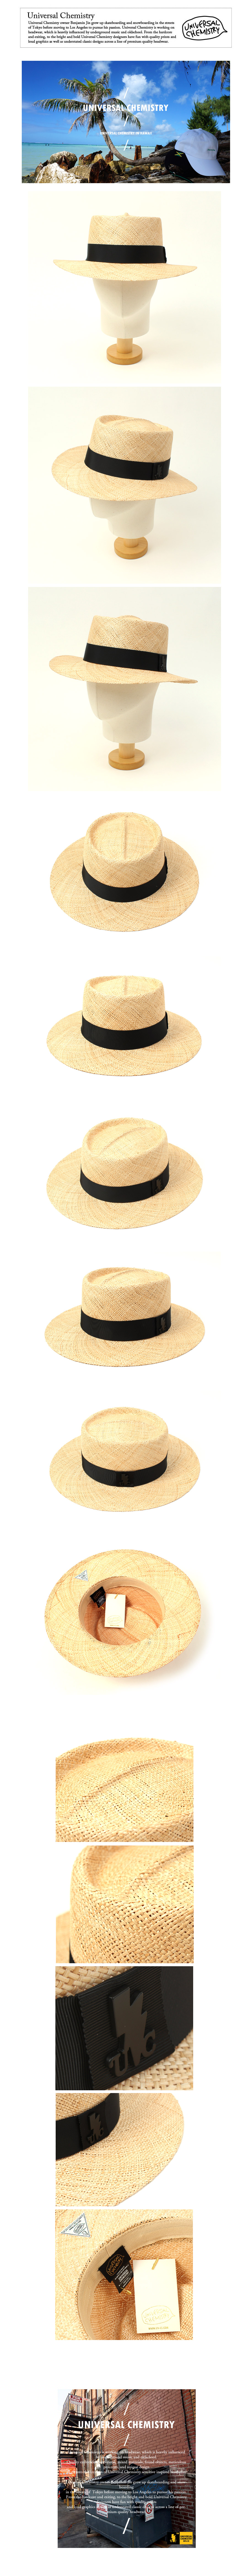 BKMT Bau Jungle Panama Hat 여름페도라